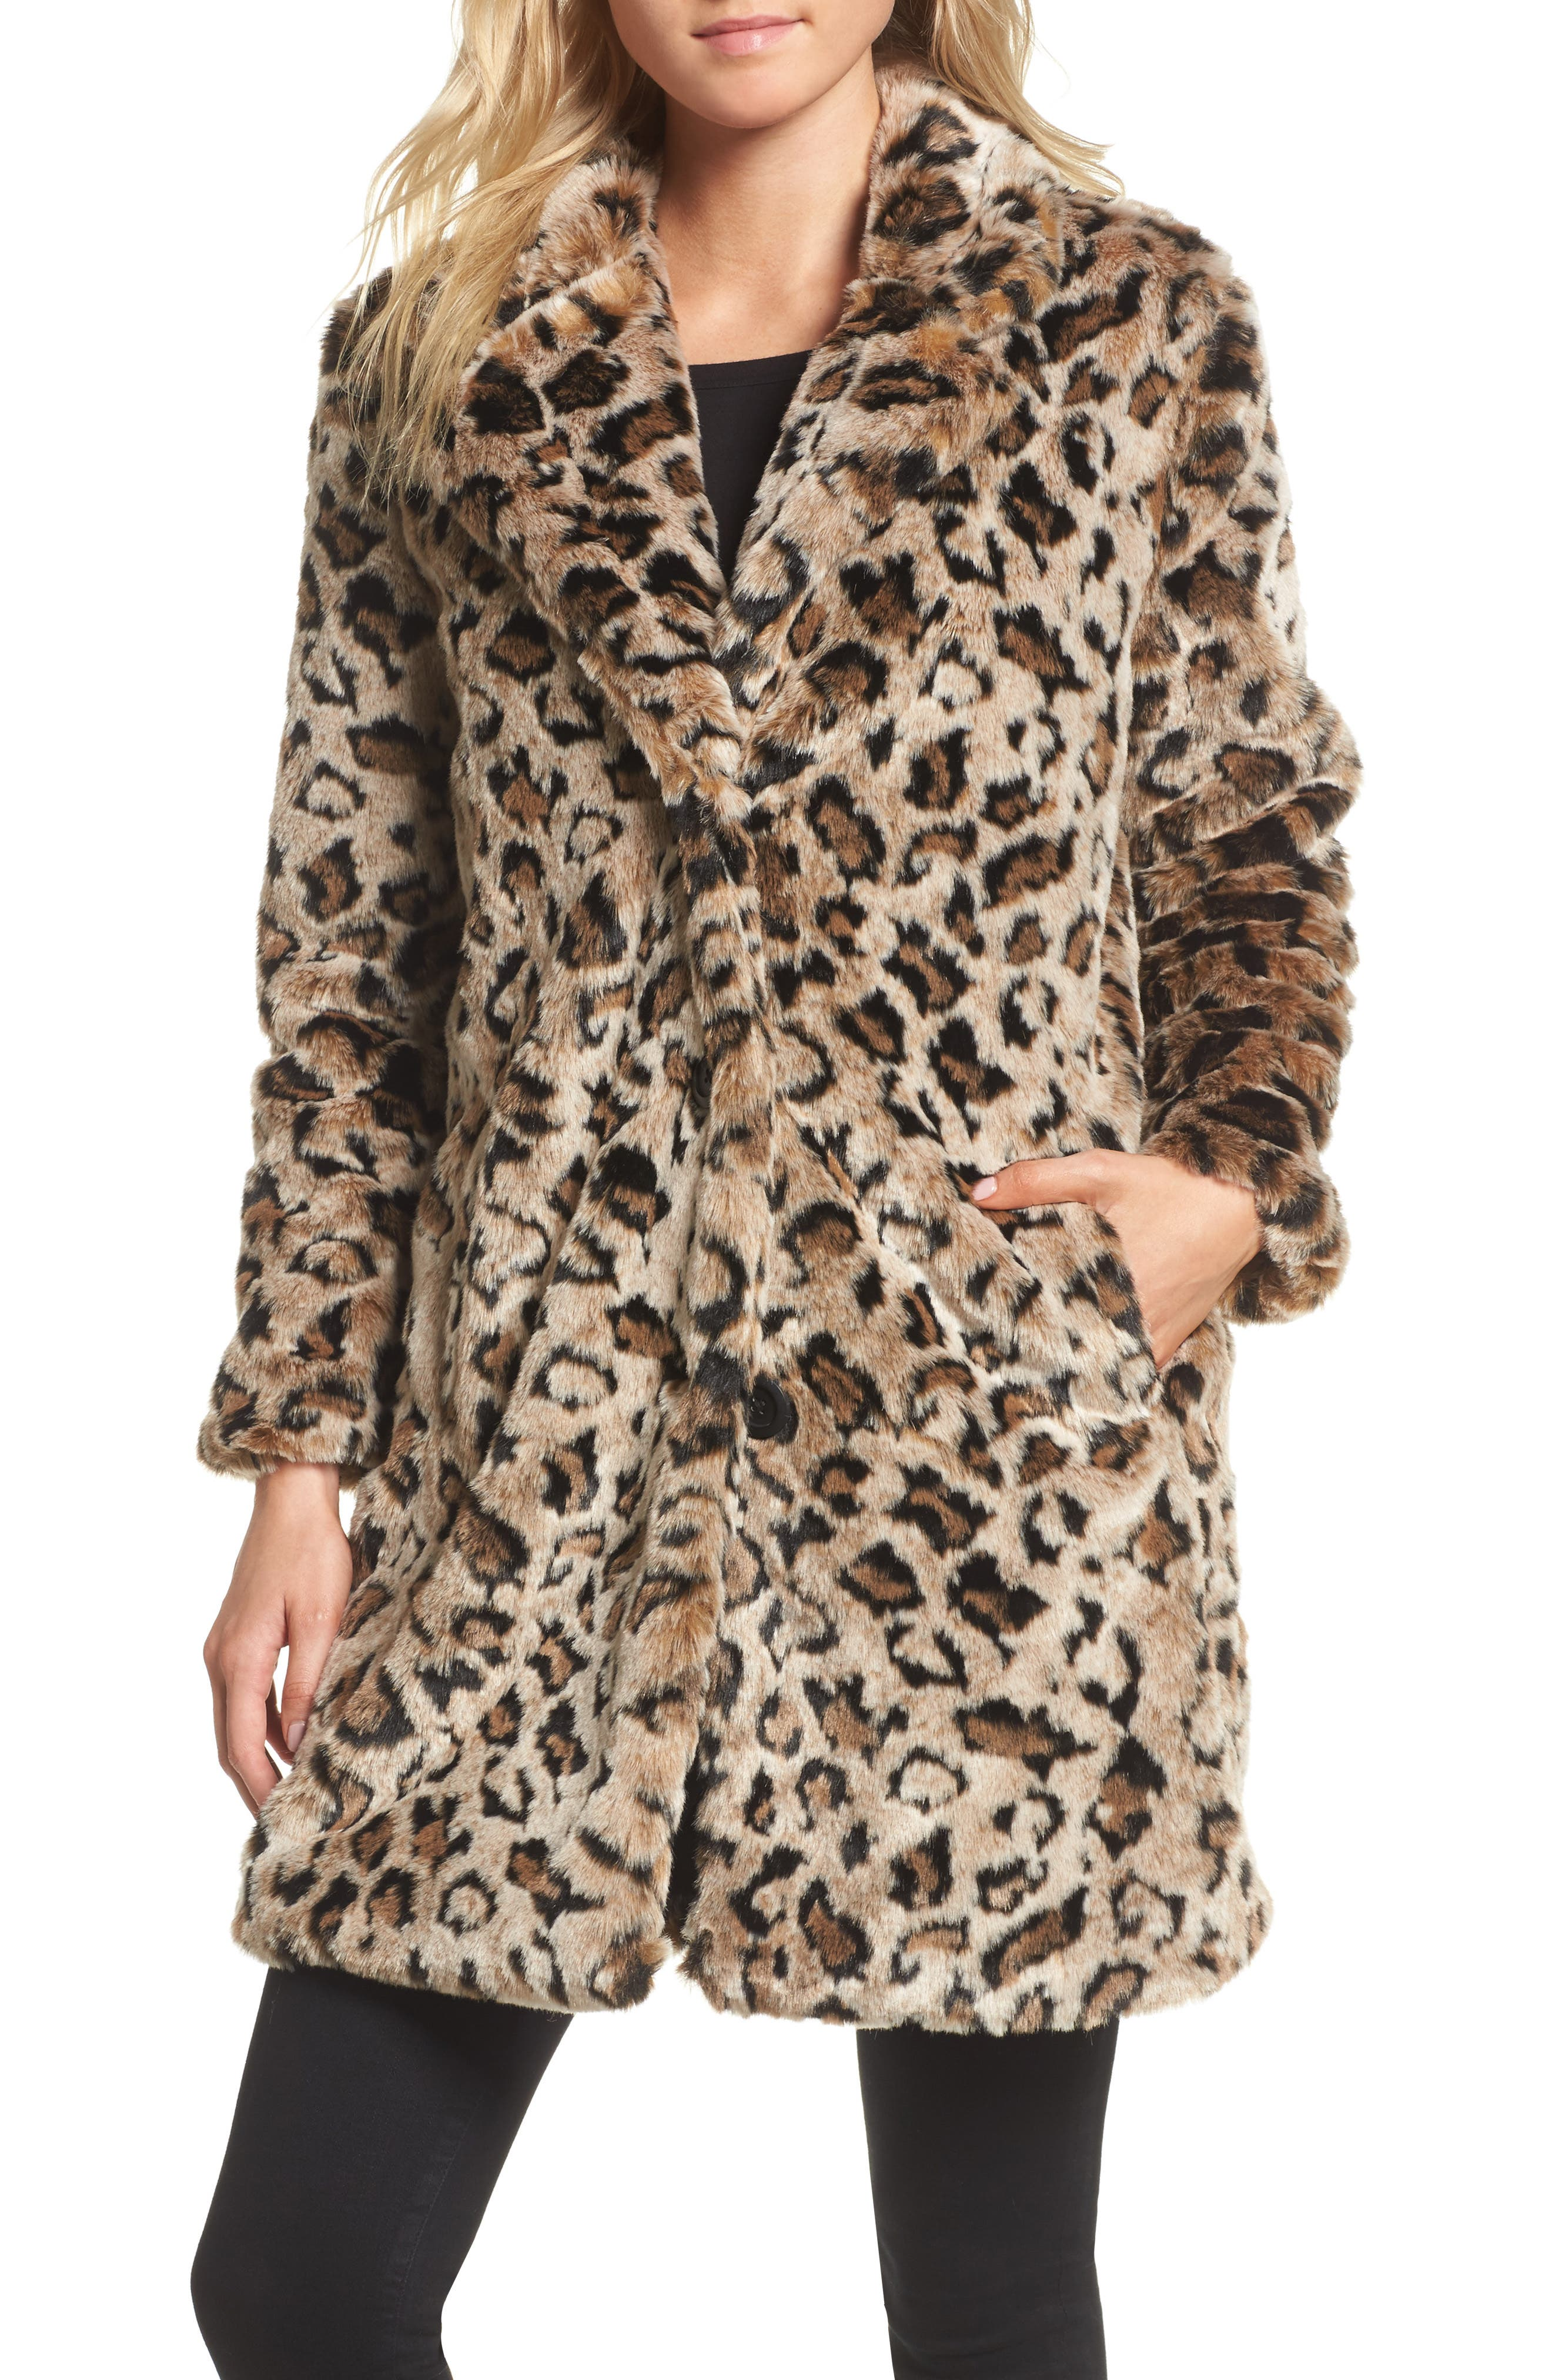 Abeni Faux Fur Coat,                             Alternate thumbnail 4, color,                             230